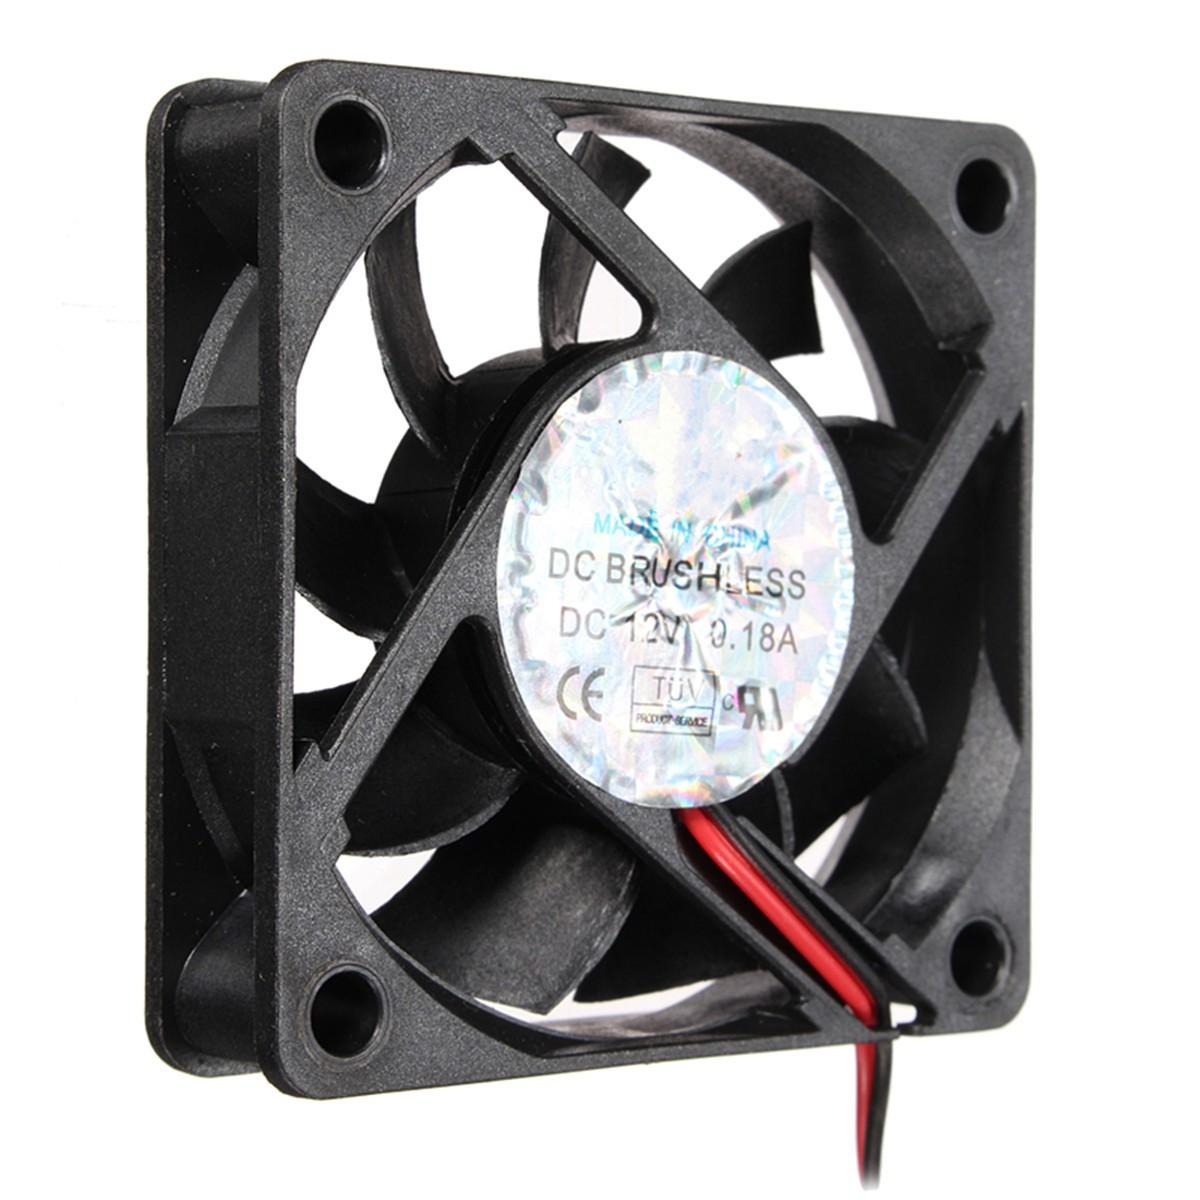 4Pin DC 12V 60mm x 60mm x 15MM Computer CPU Cooler Cooling Fan PC(China (Mainland))